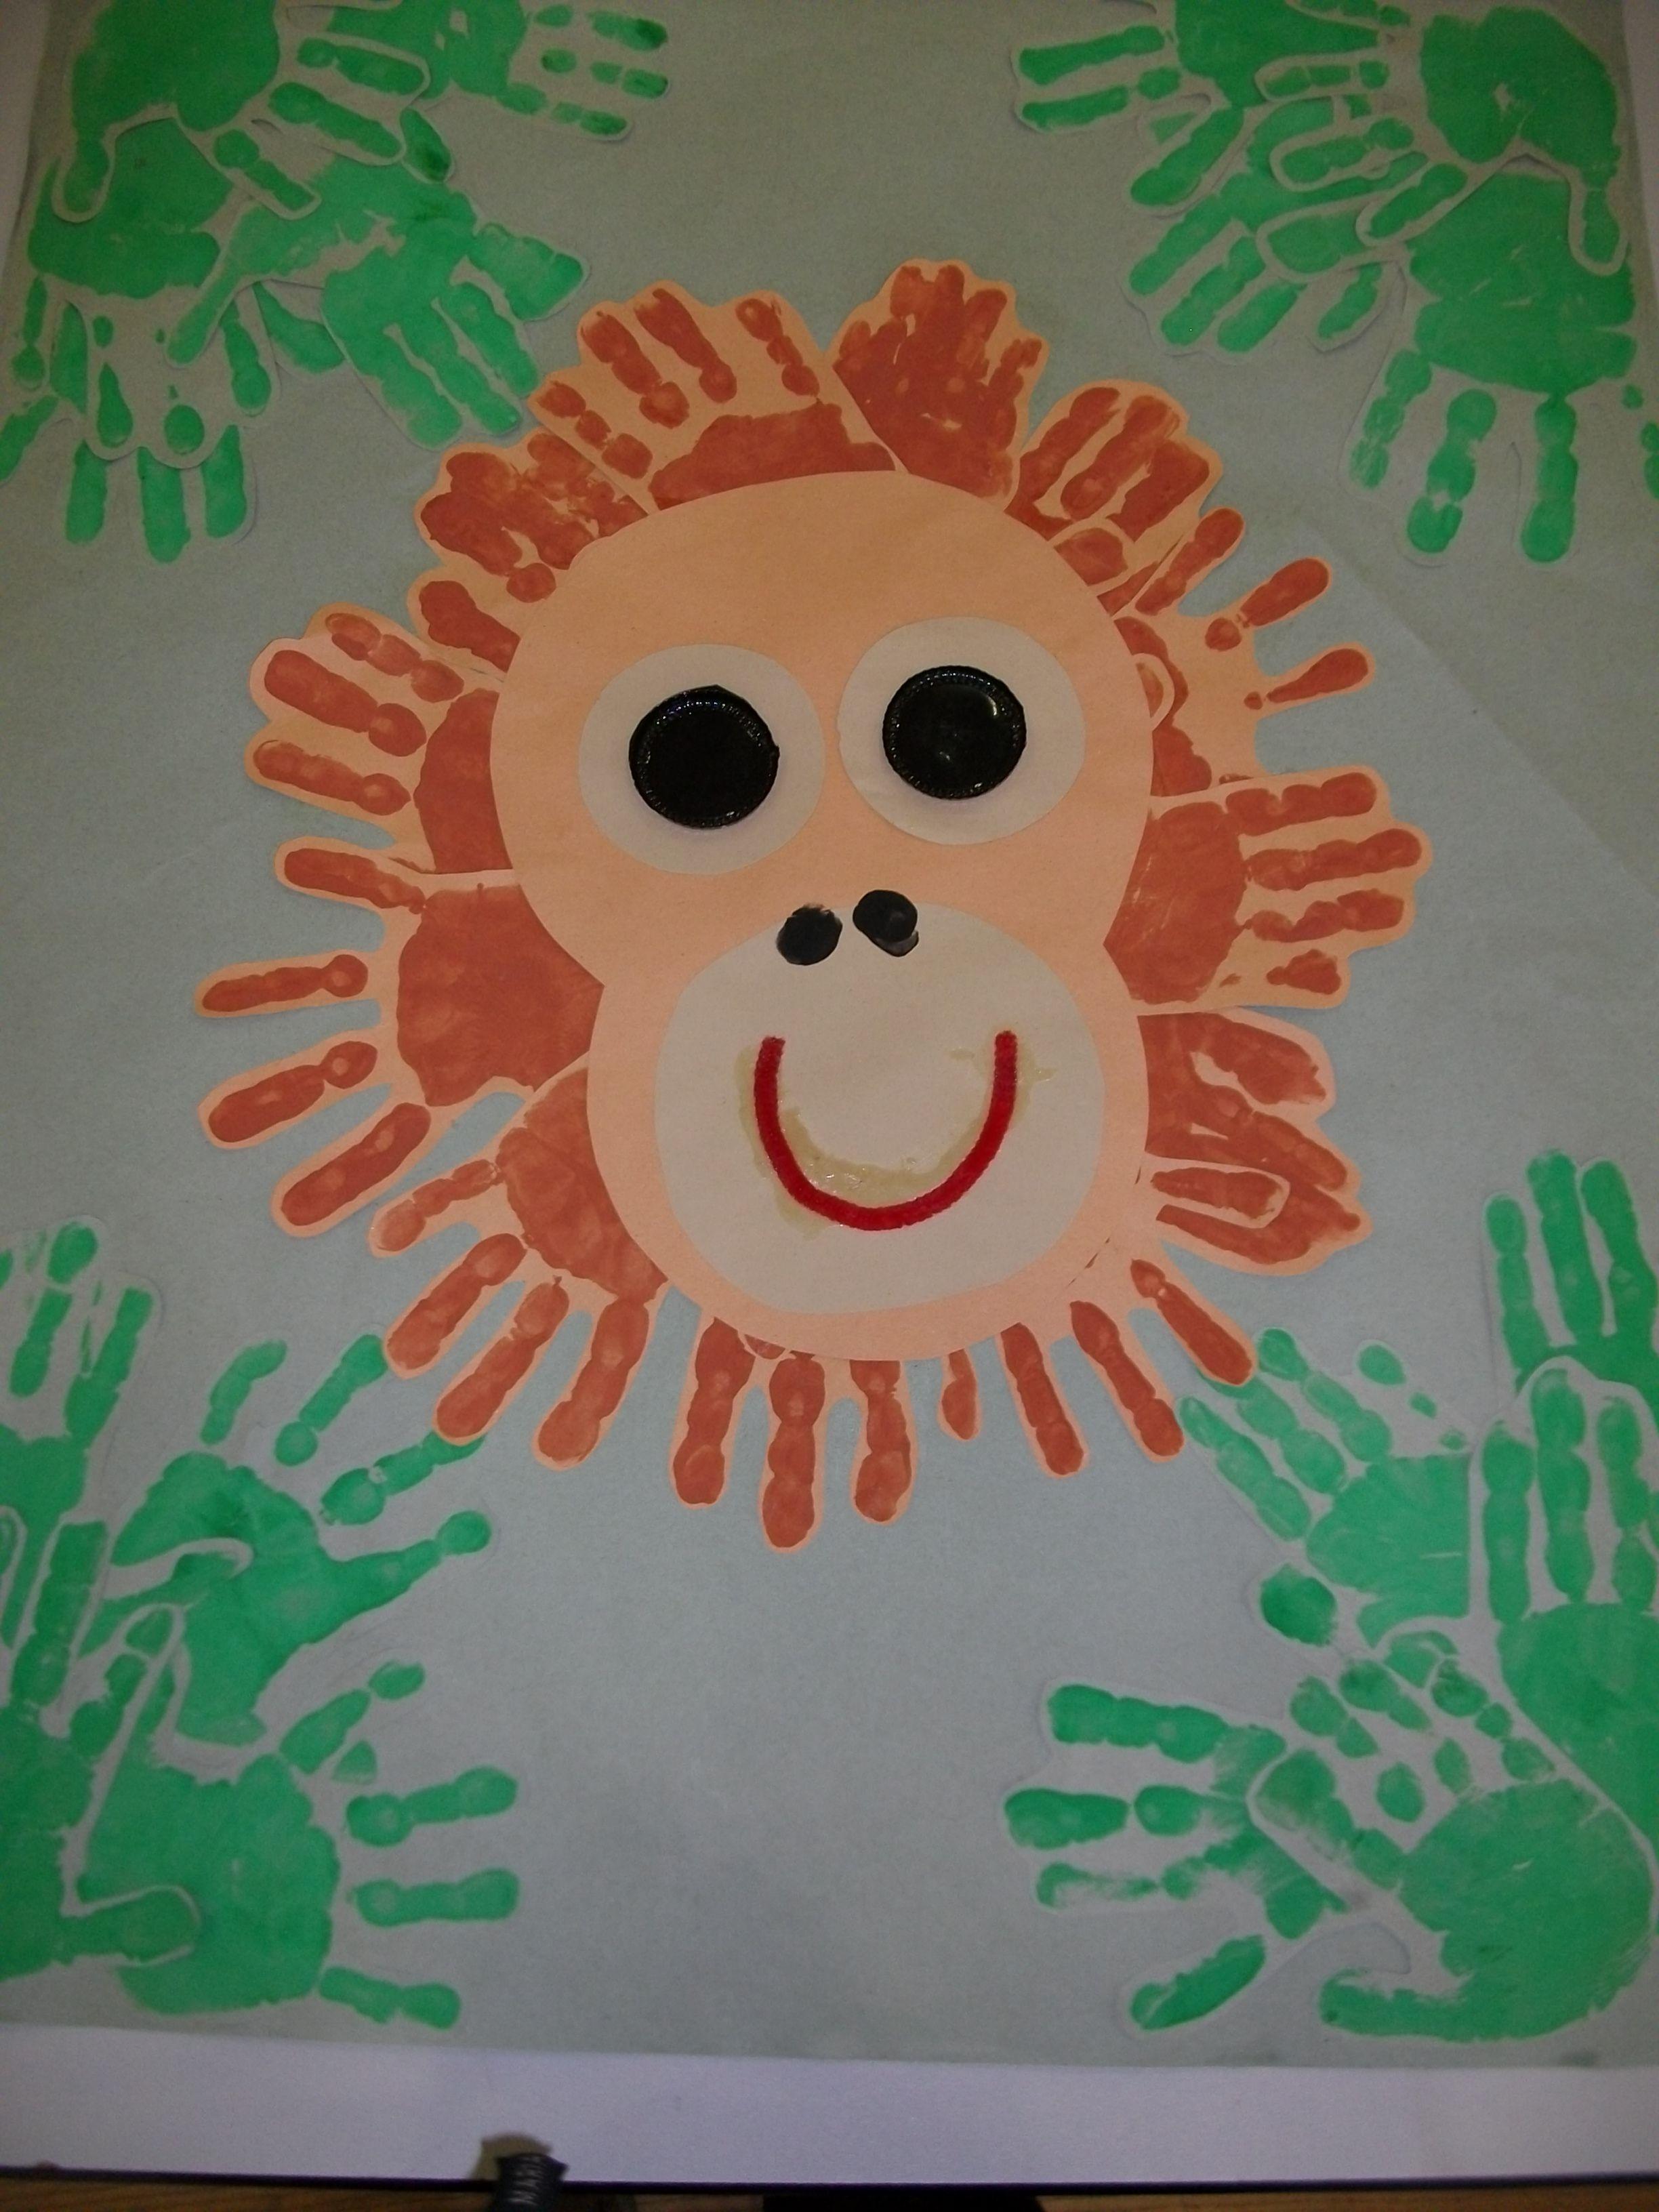 Hands For Orangutans